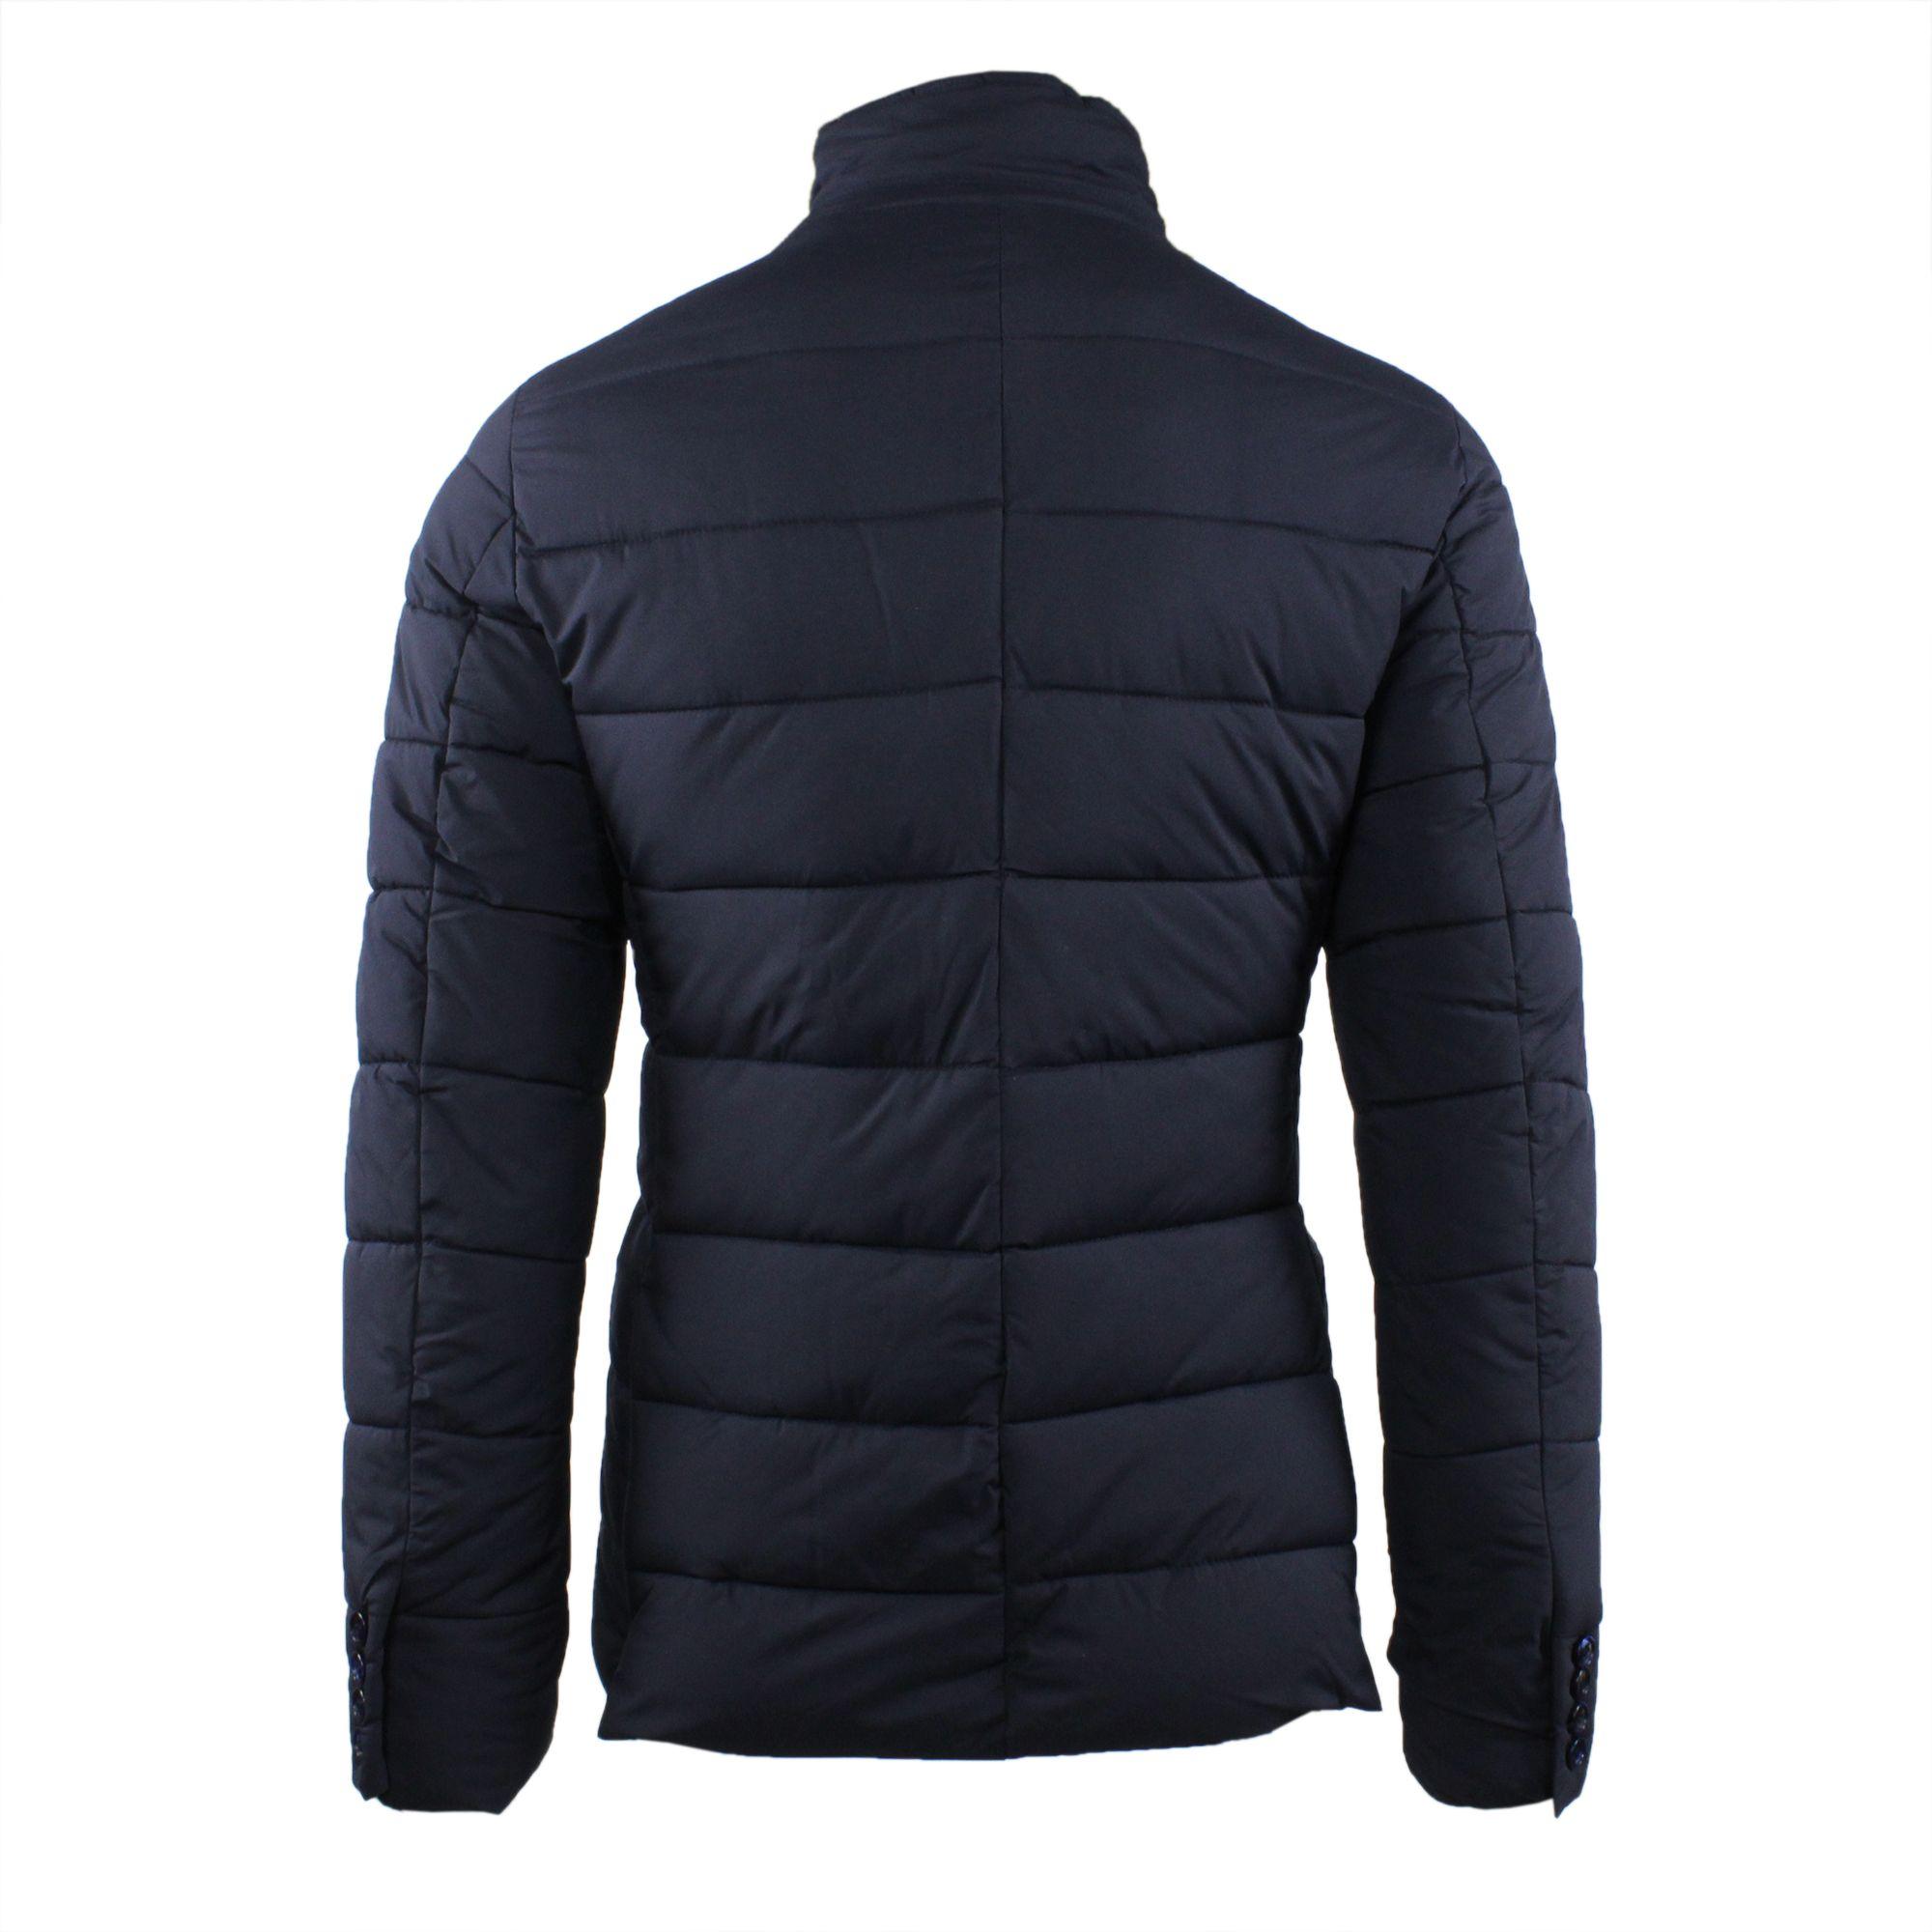 Giubbotto-Uomo-Invernale-Giacca-Trapuntata-Giaccone-Slim-Fit-Elegante-Blu-Nero miniatura 6